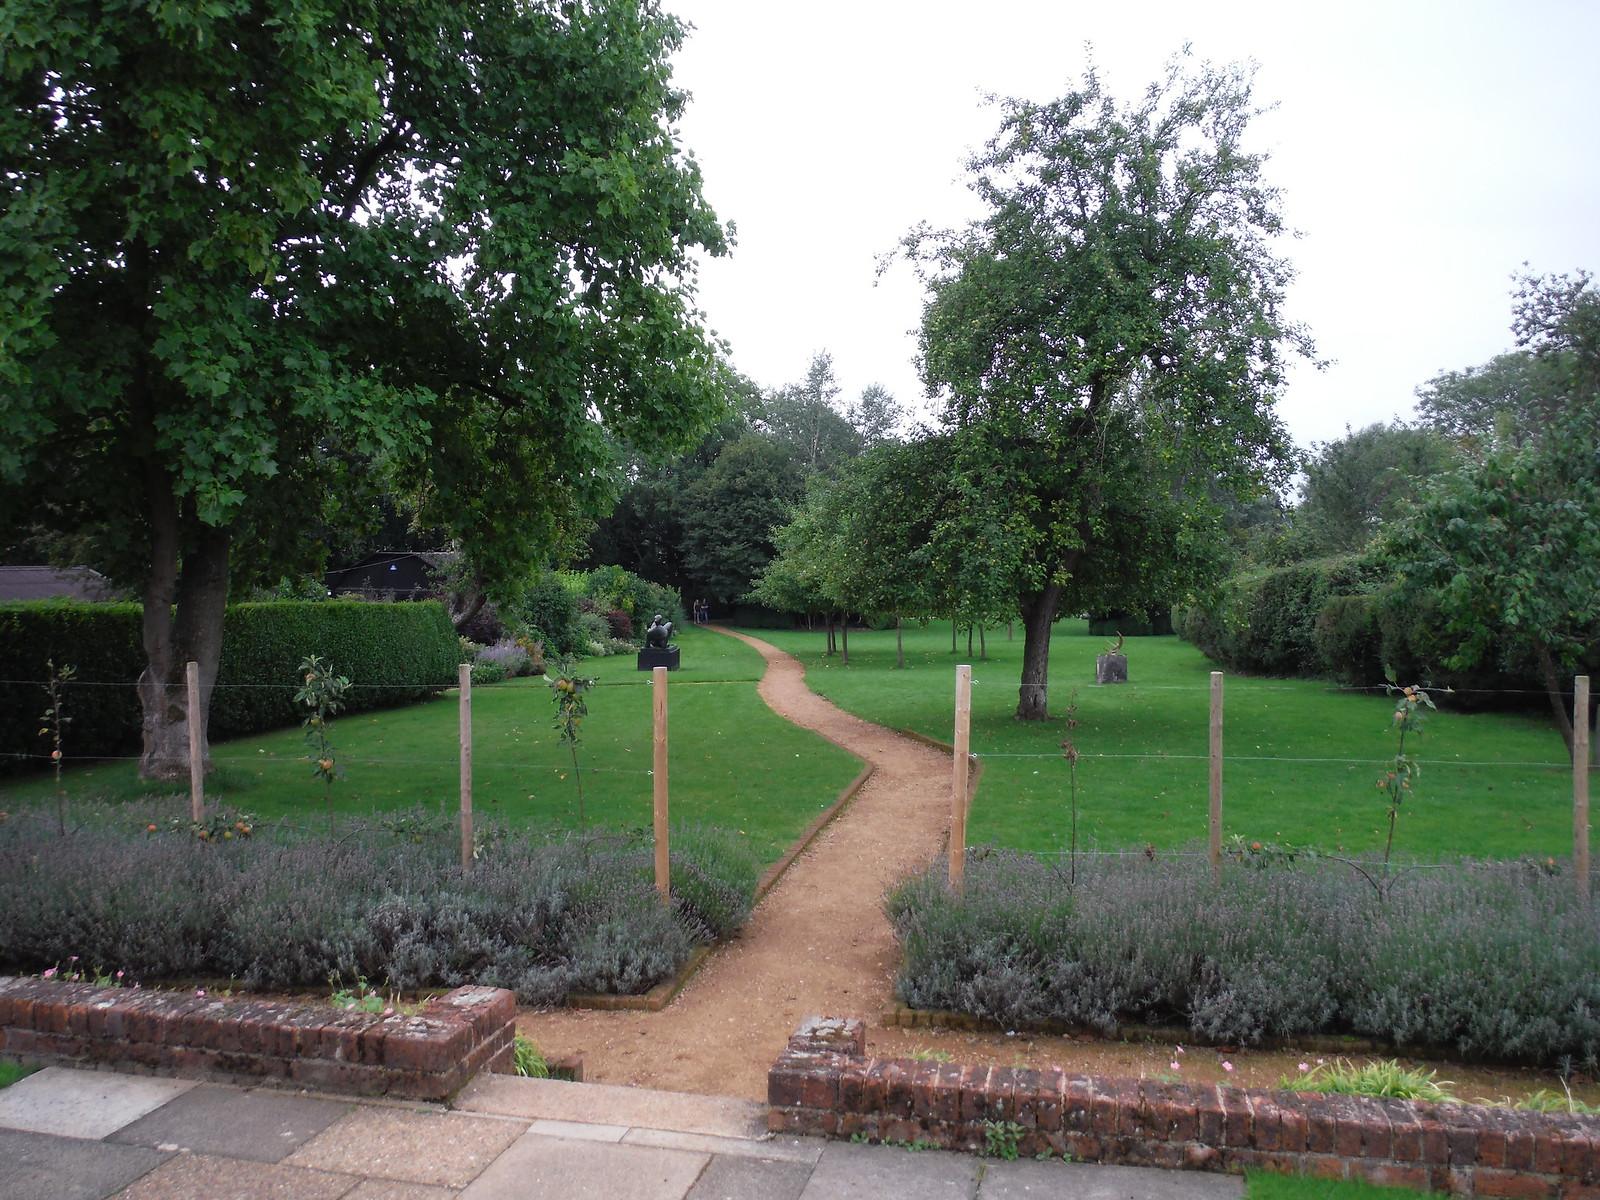 Henry Moore Foundation from Hoglands' terrace SWC Walk 164 Roydon to Sawbridgeworth via Henry Moore Foundation